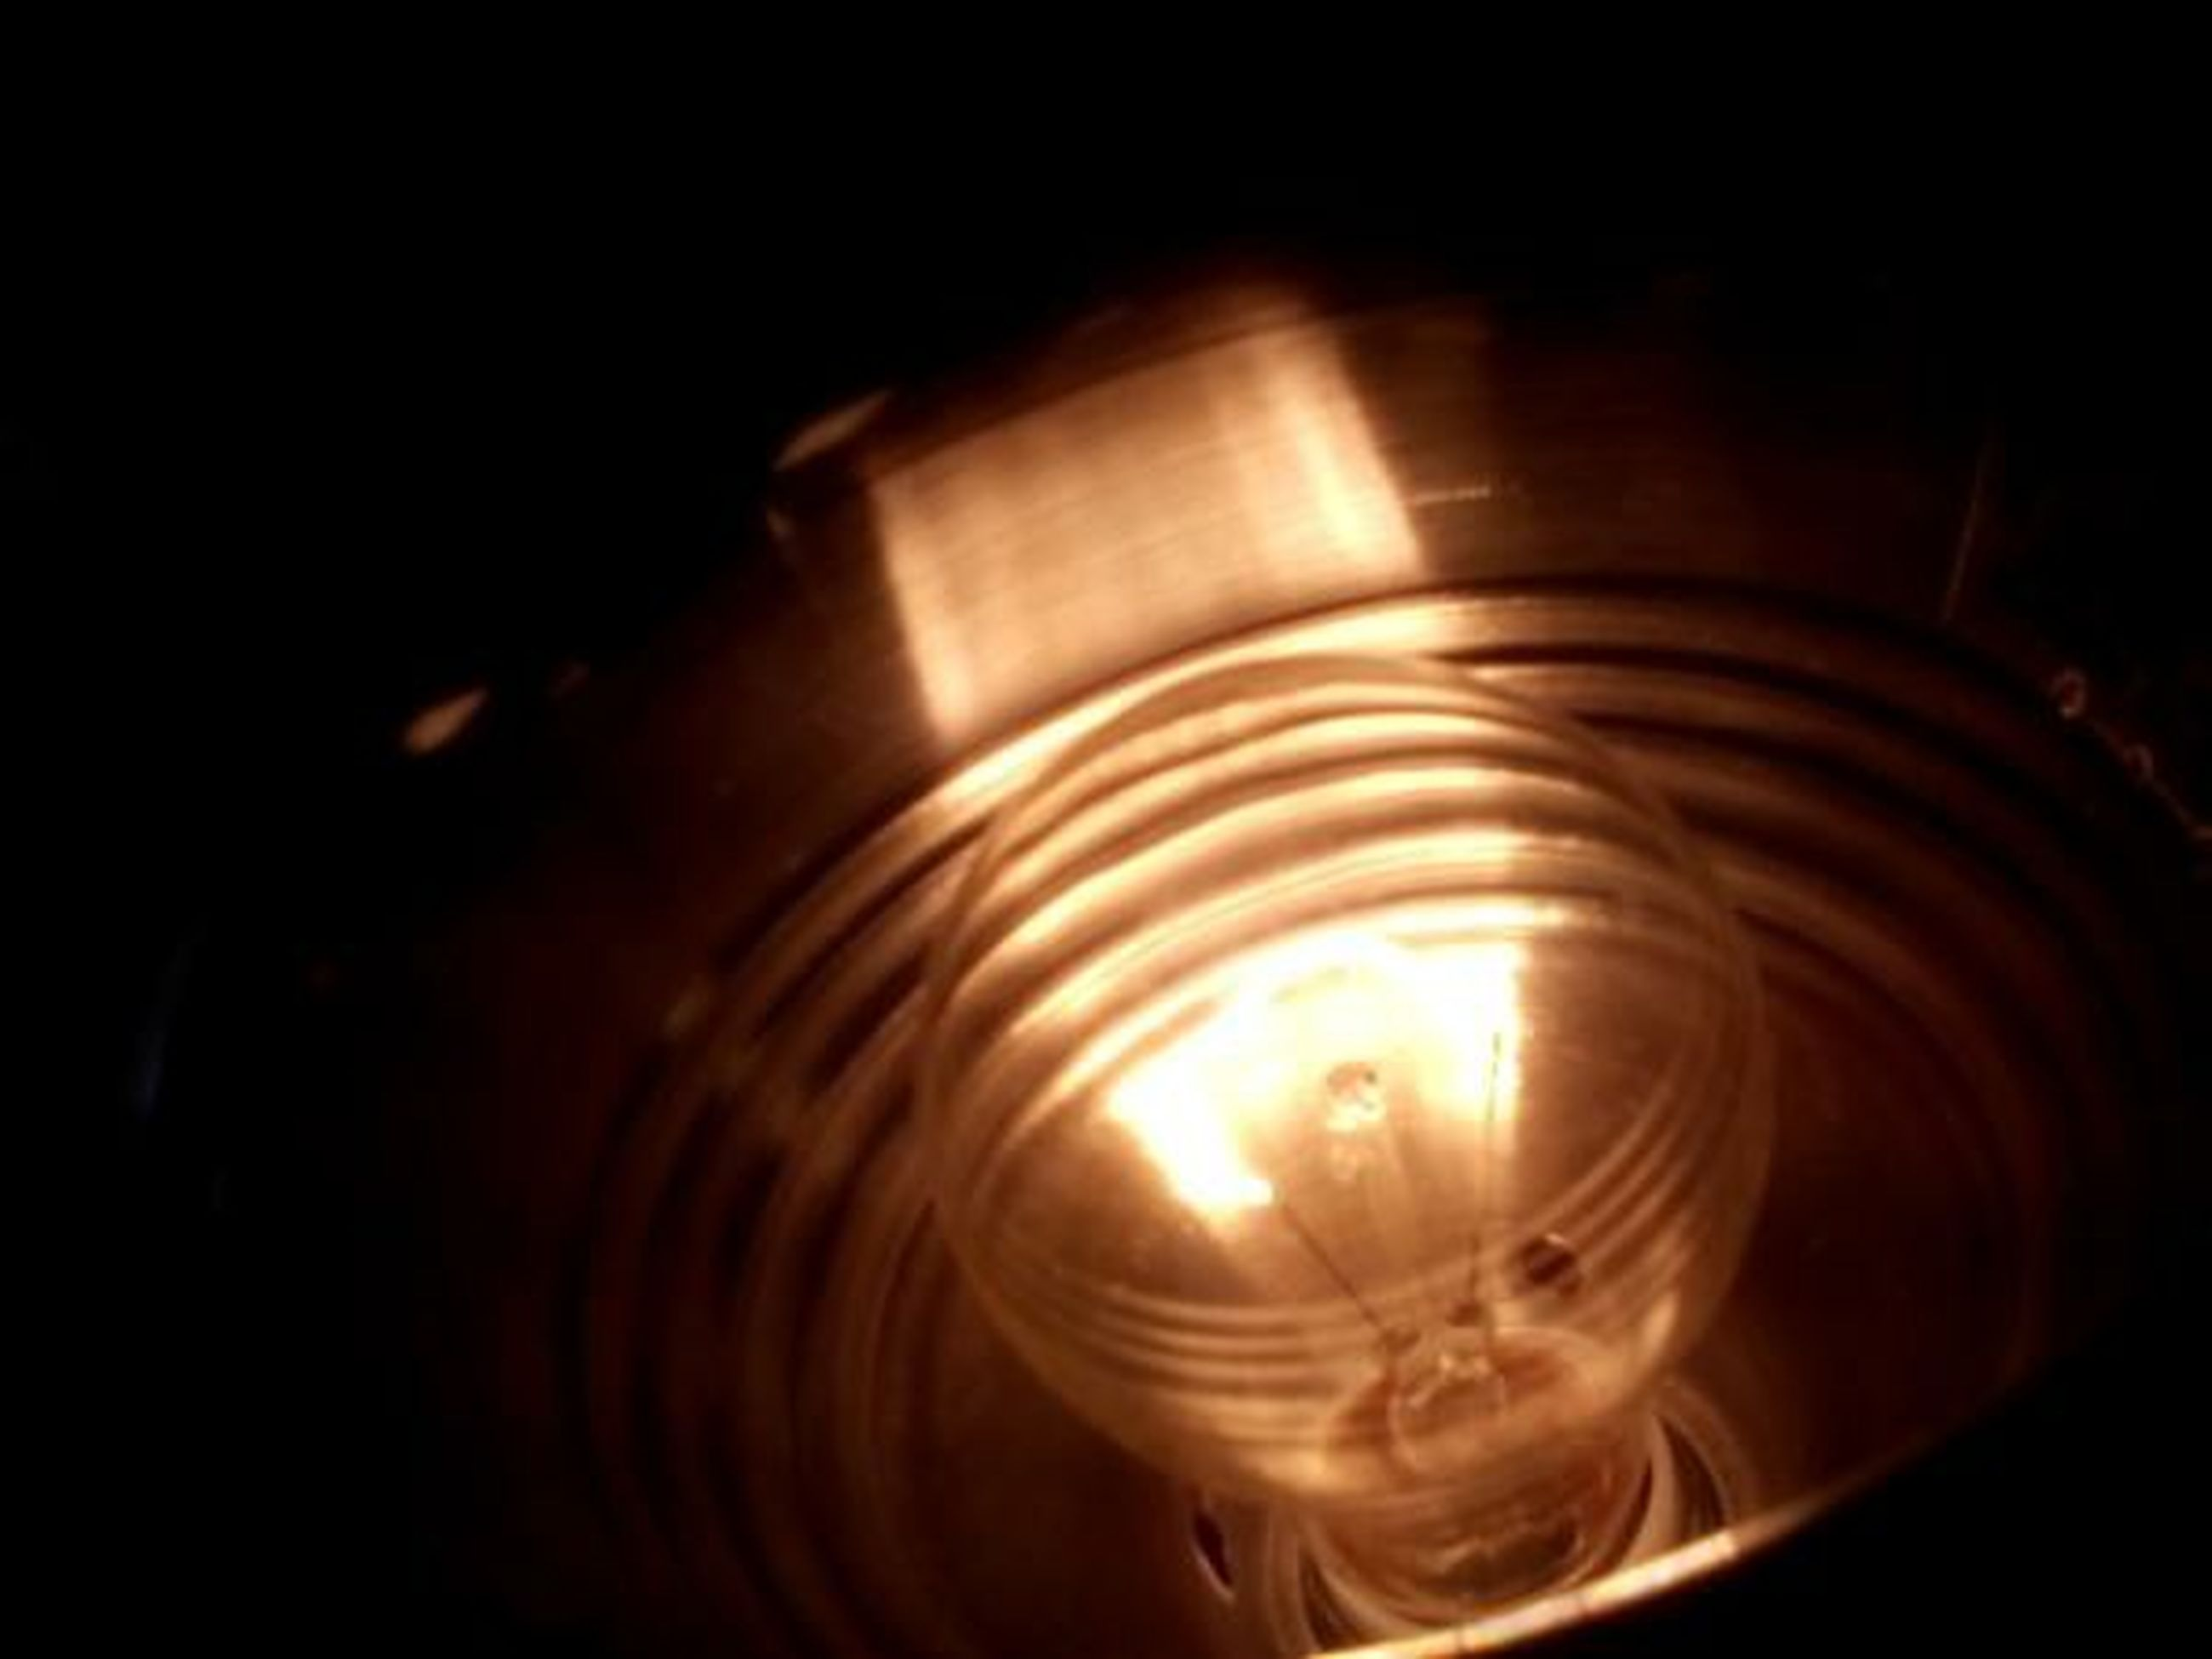 indoors, illuminated, lighting equipment, glowing, darkroom, black background, dark, night, studio shot, close-up, electricity, light - natural phenomenon, lit, copy space, light, electric light, no people, glass - material, pattern, reflection